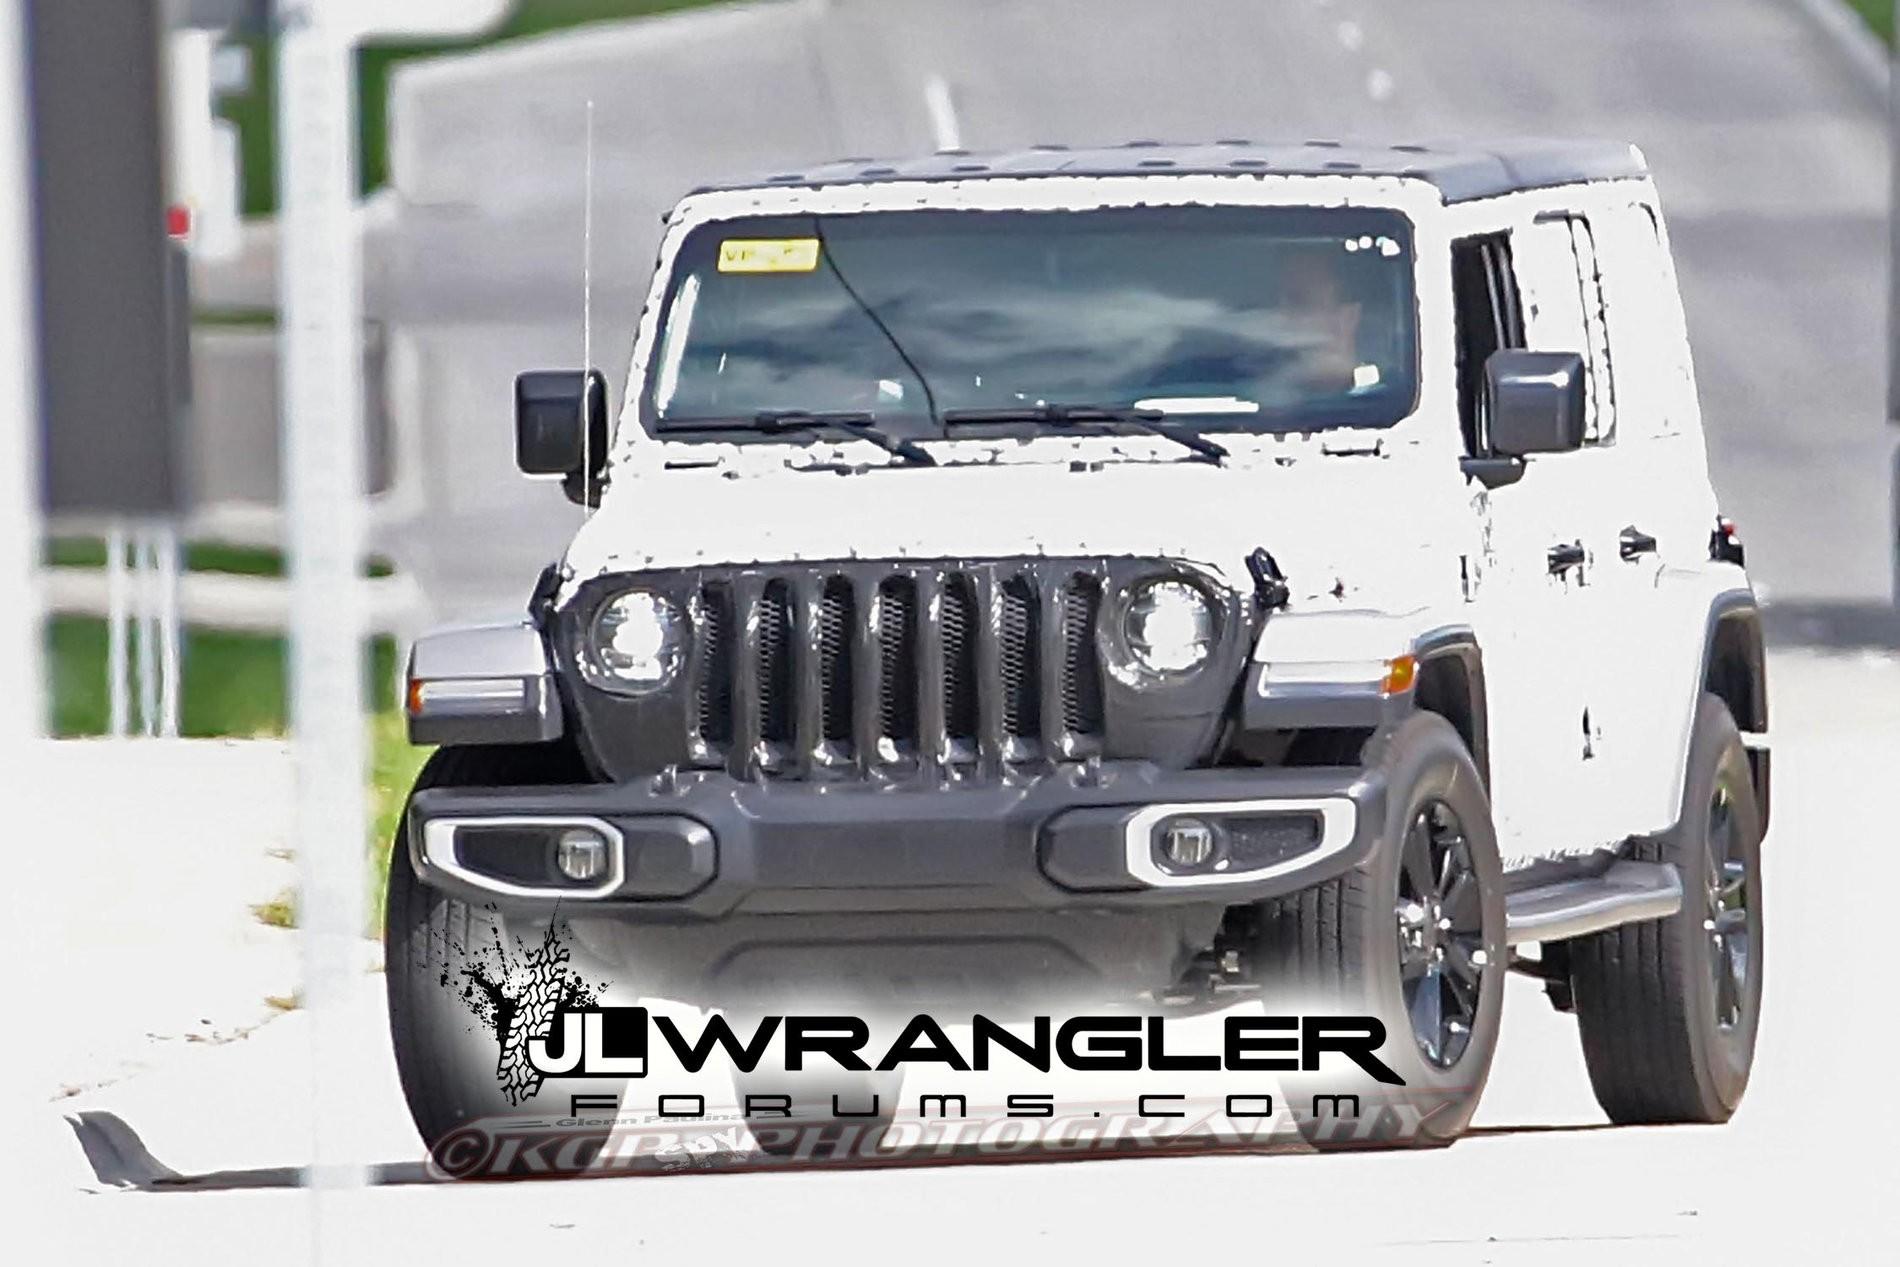 2018 JL Wrangler Uncovered JLWRANGLERFORUMS 16